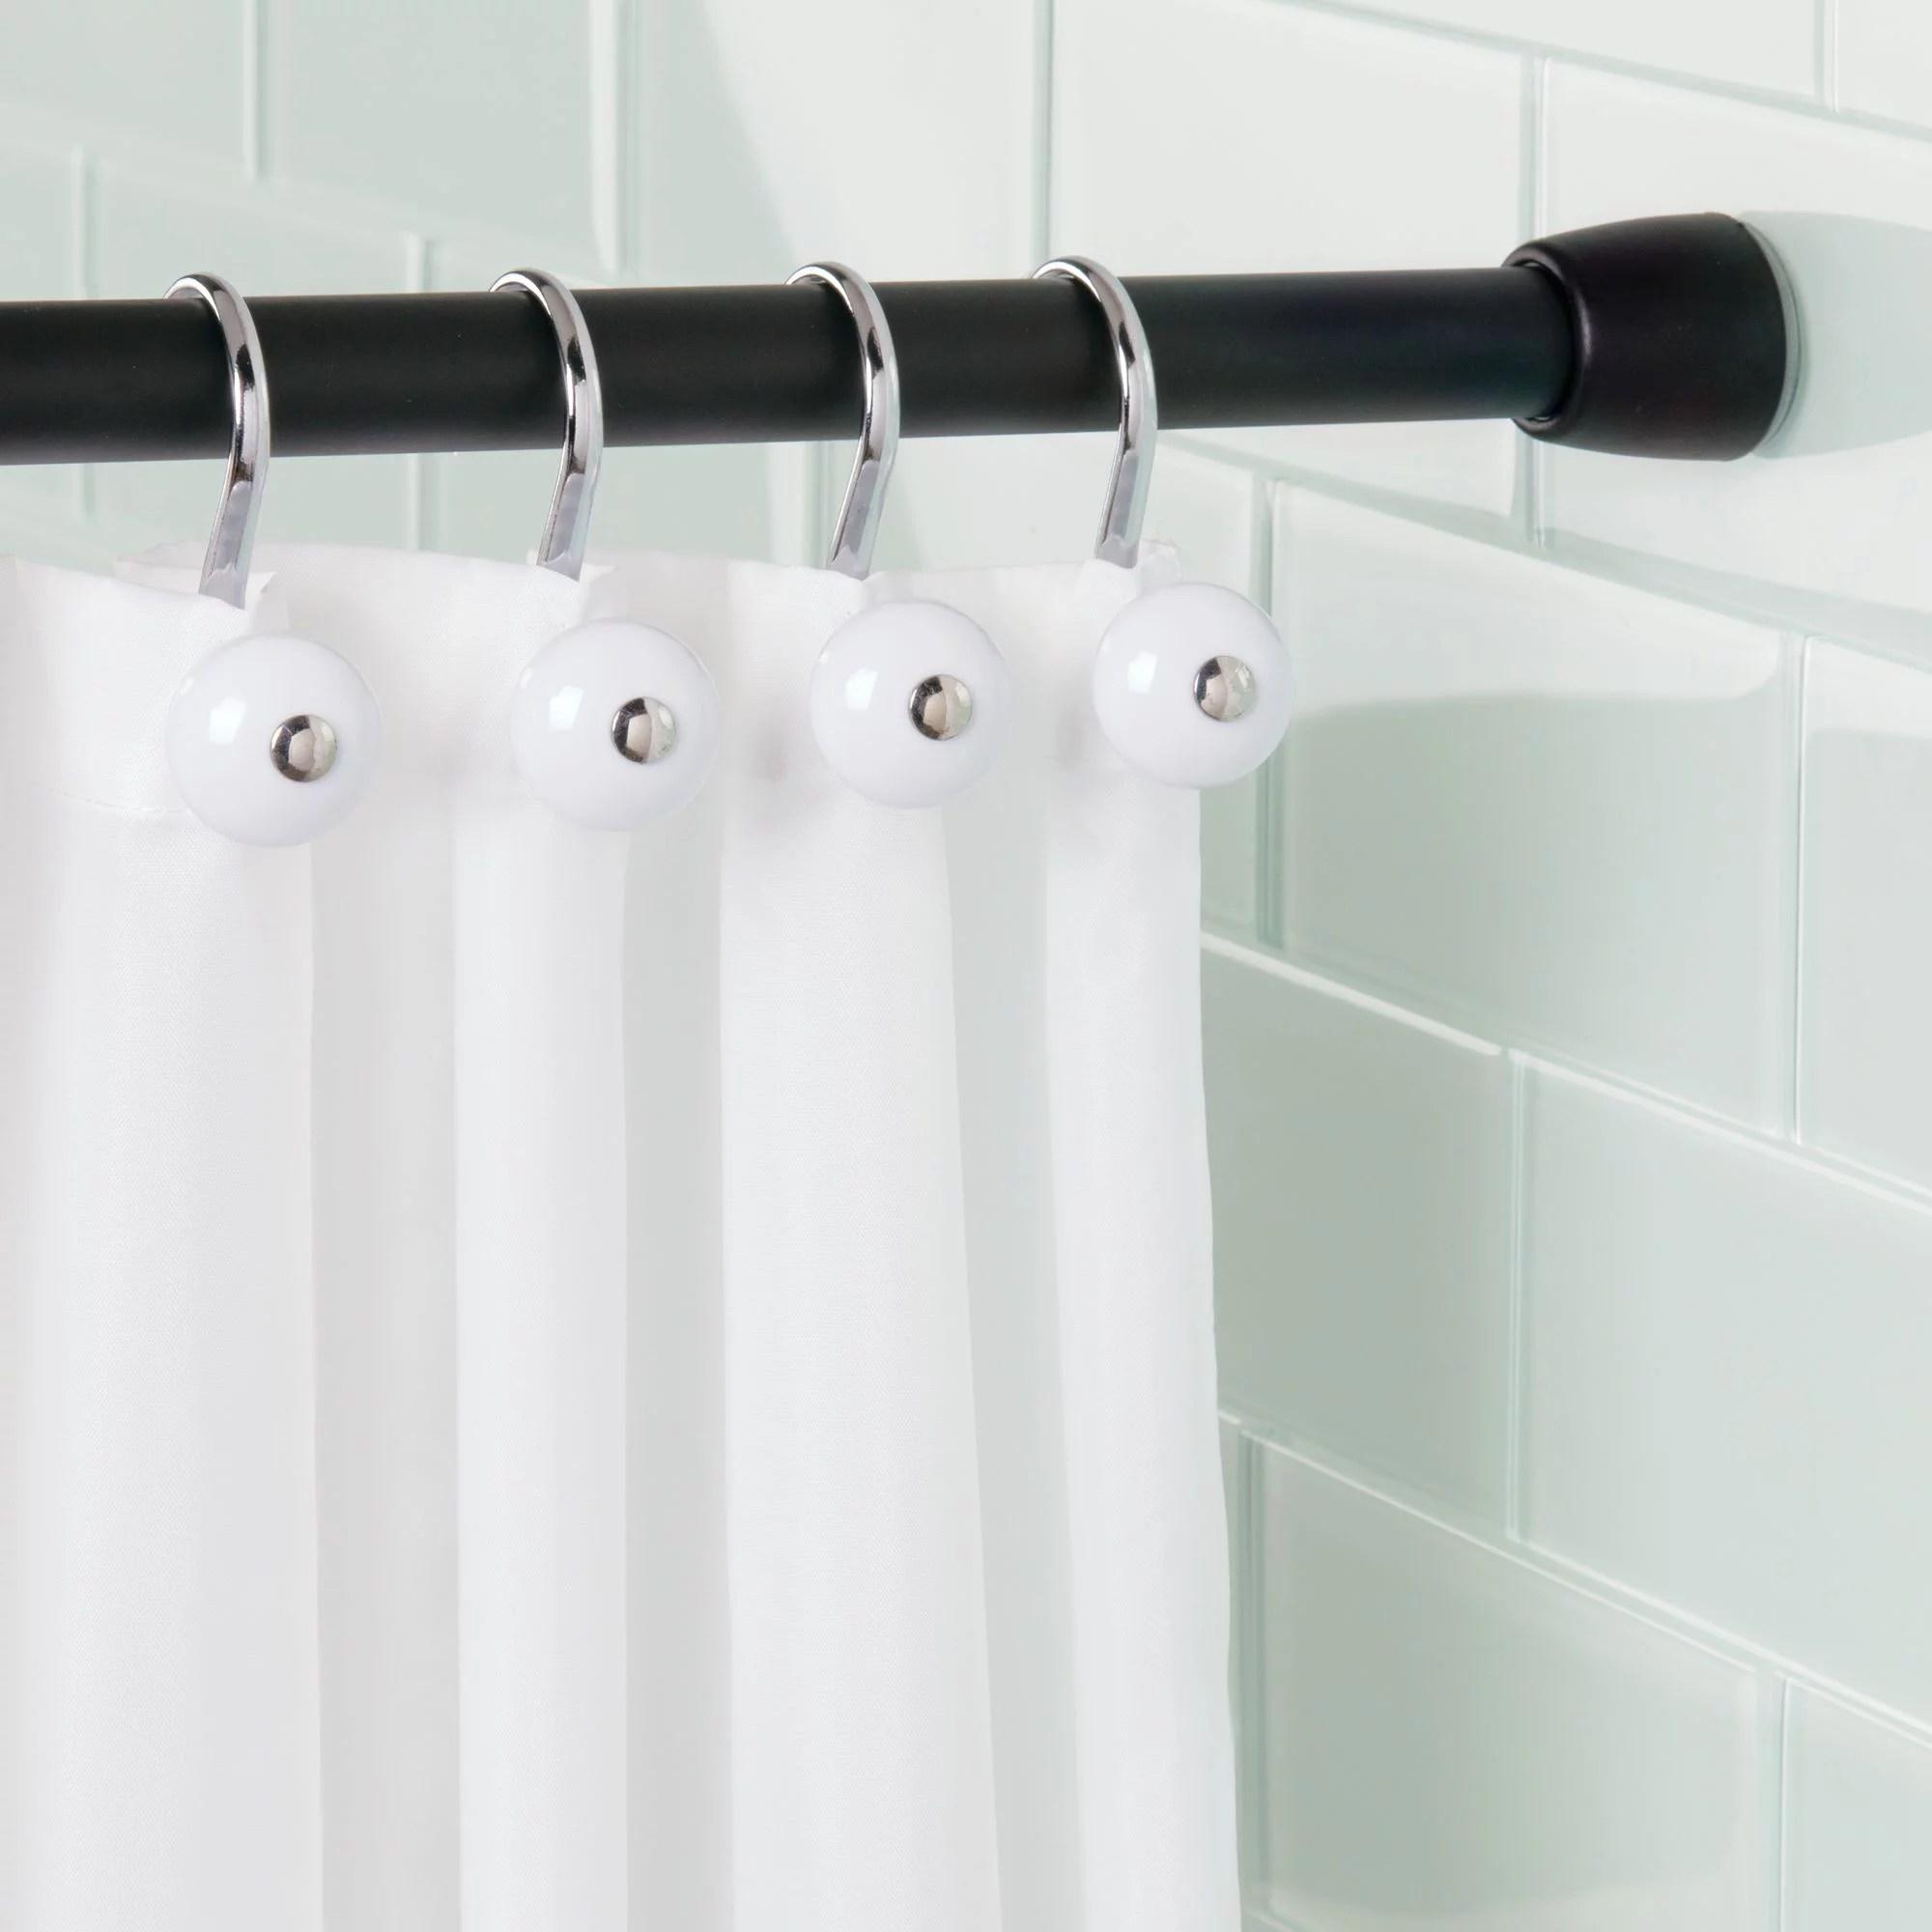 interdesign shower curtain tension rod matte black medium 43 75 walmart com